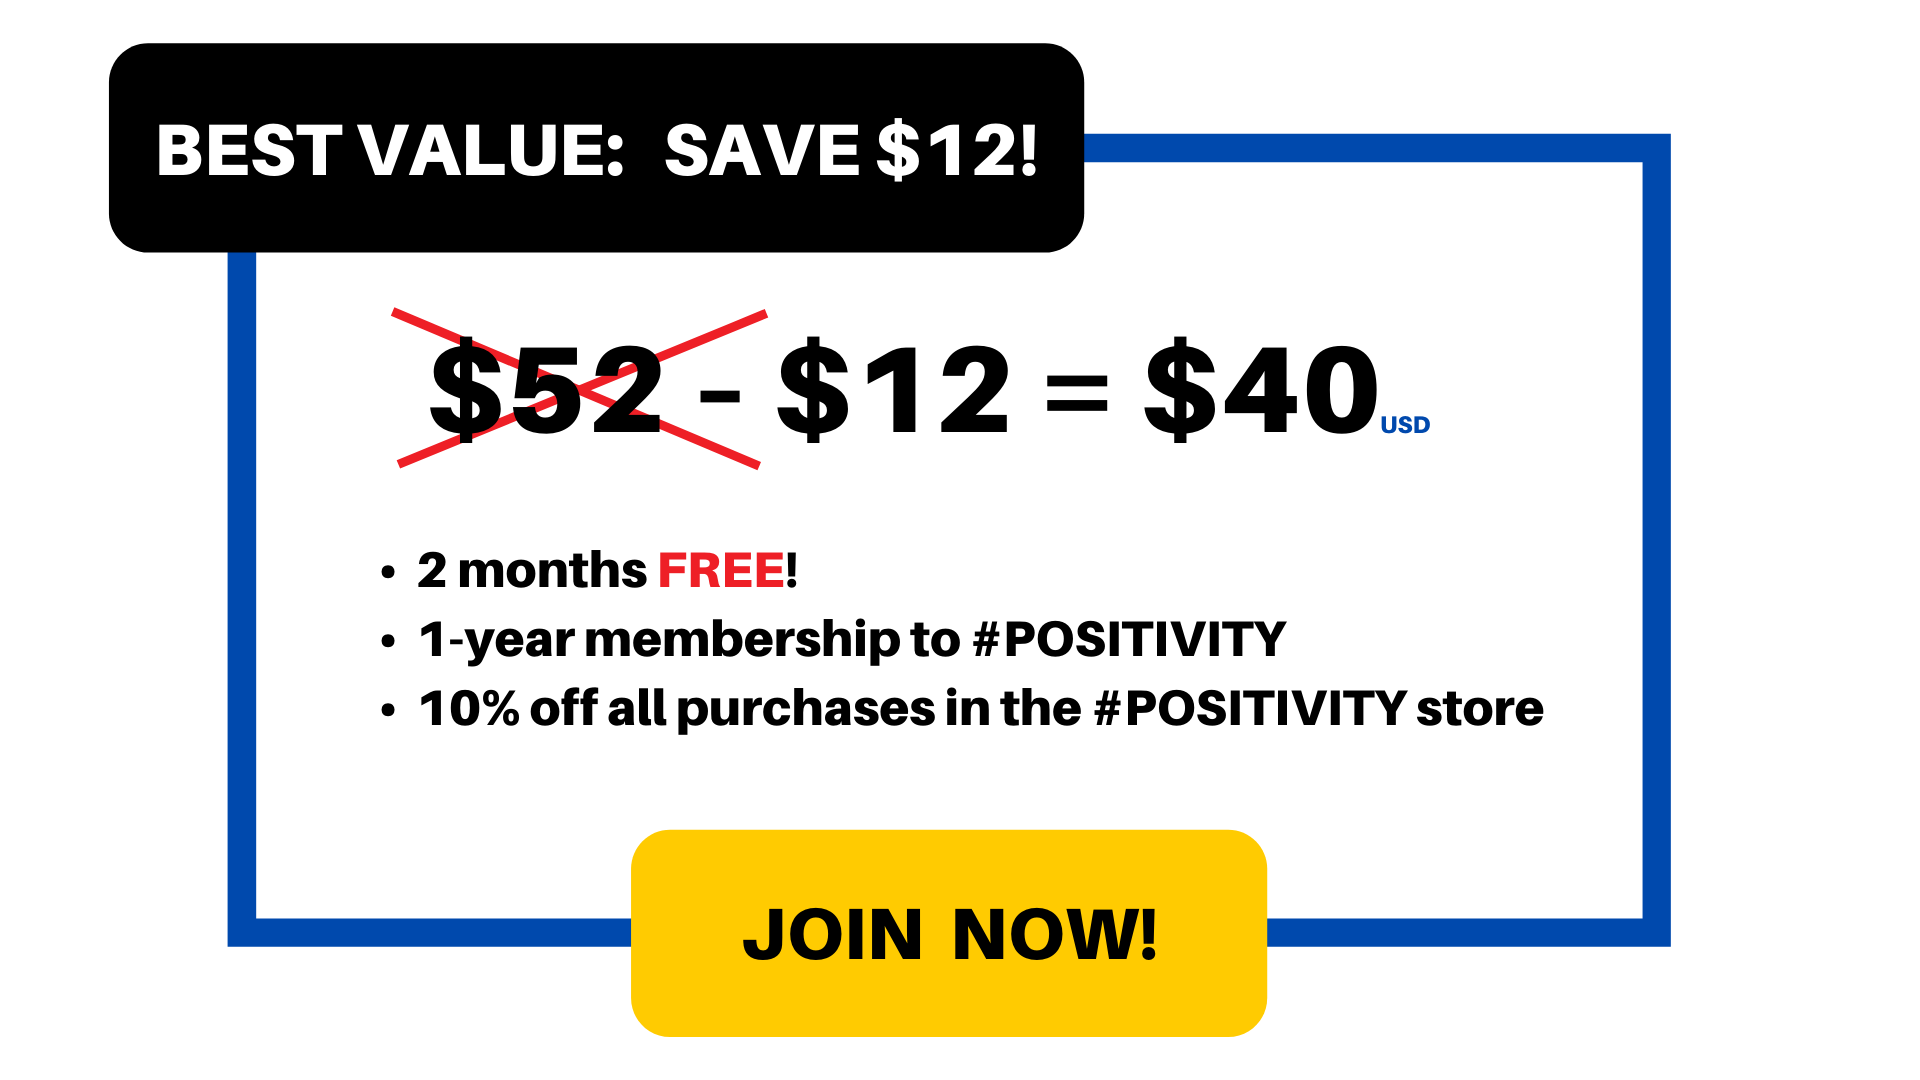 Best Value: $40